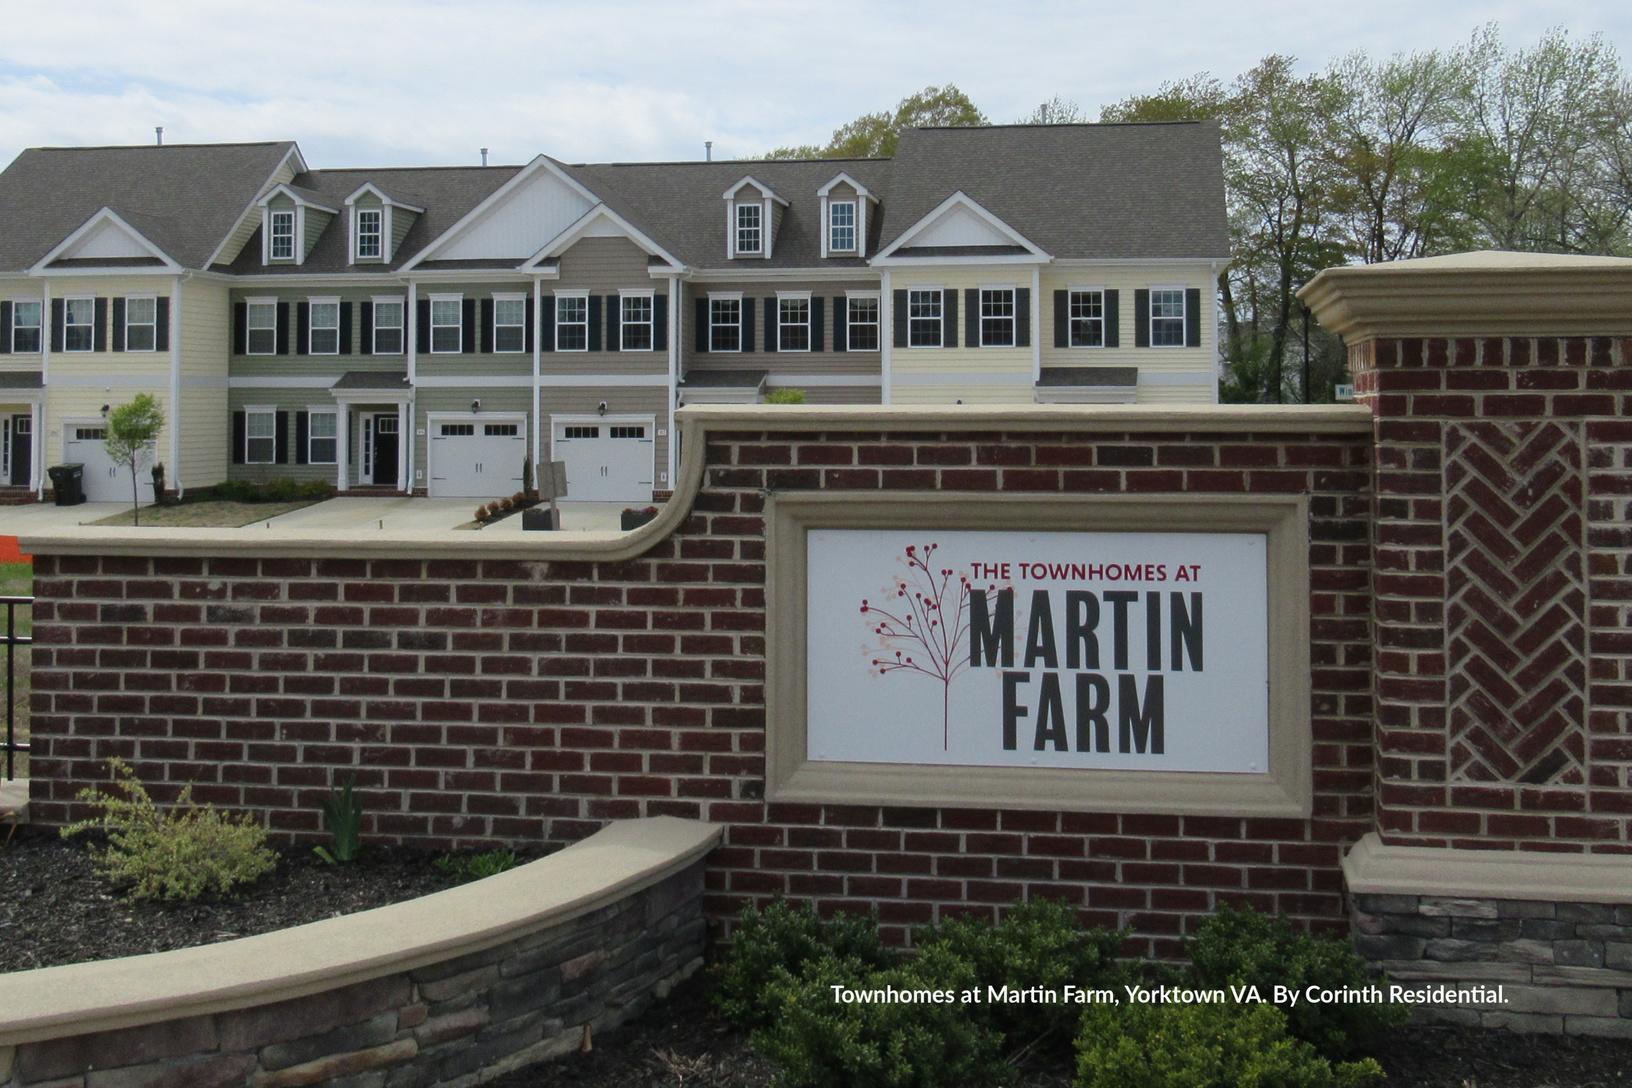 Townhomes at Martin Farm, Yorktown VA